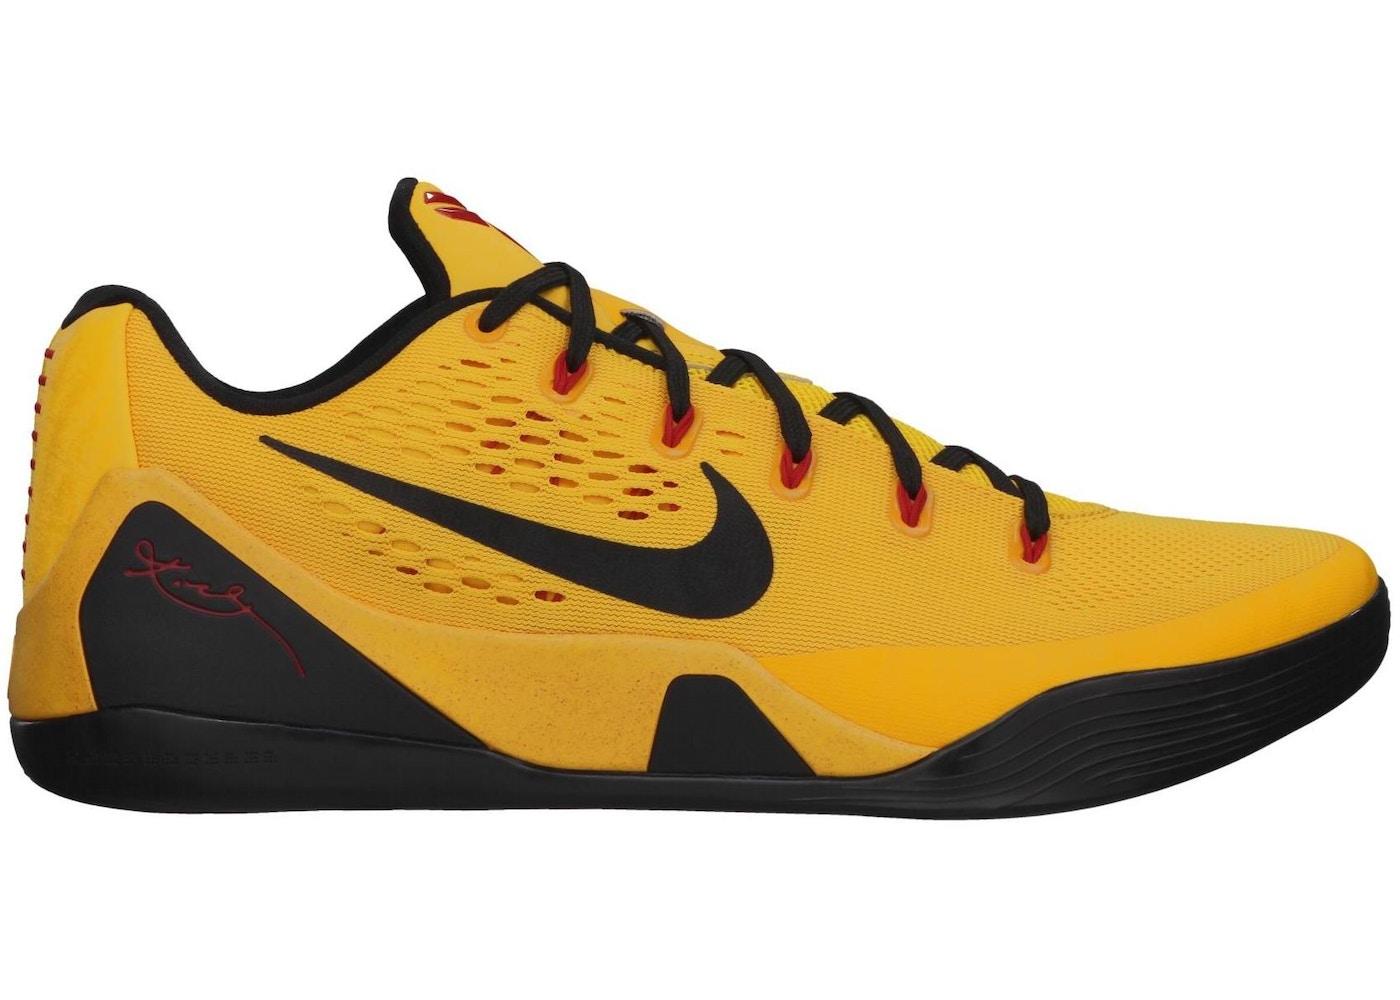 timeless design d7549 6f449 Nike Kobe 9 Shoes - Price Premium